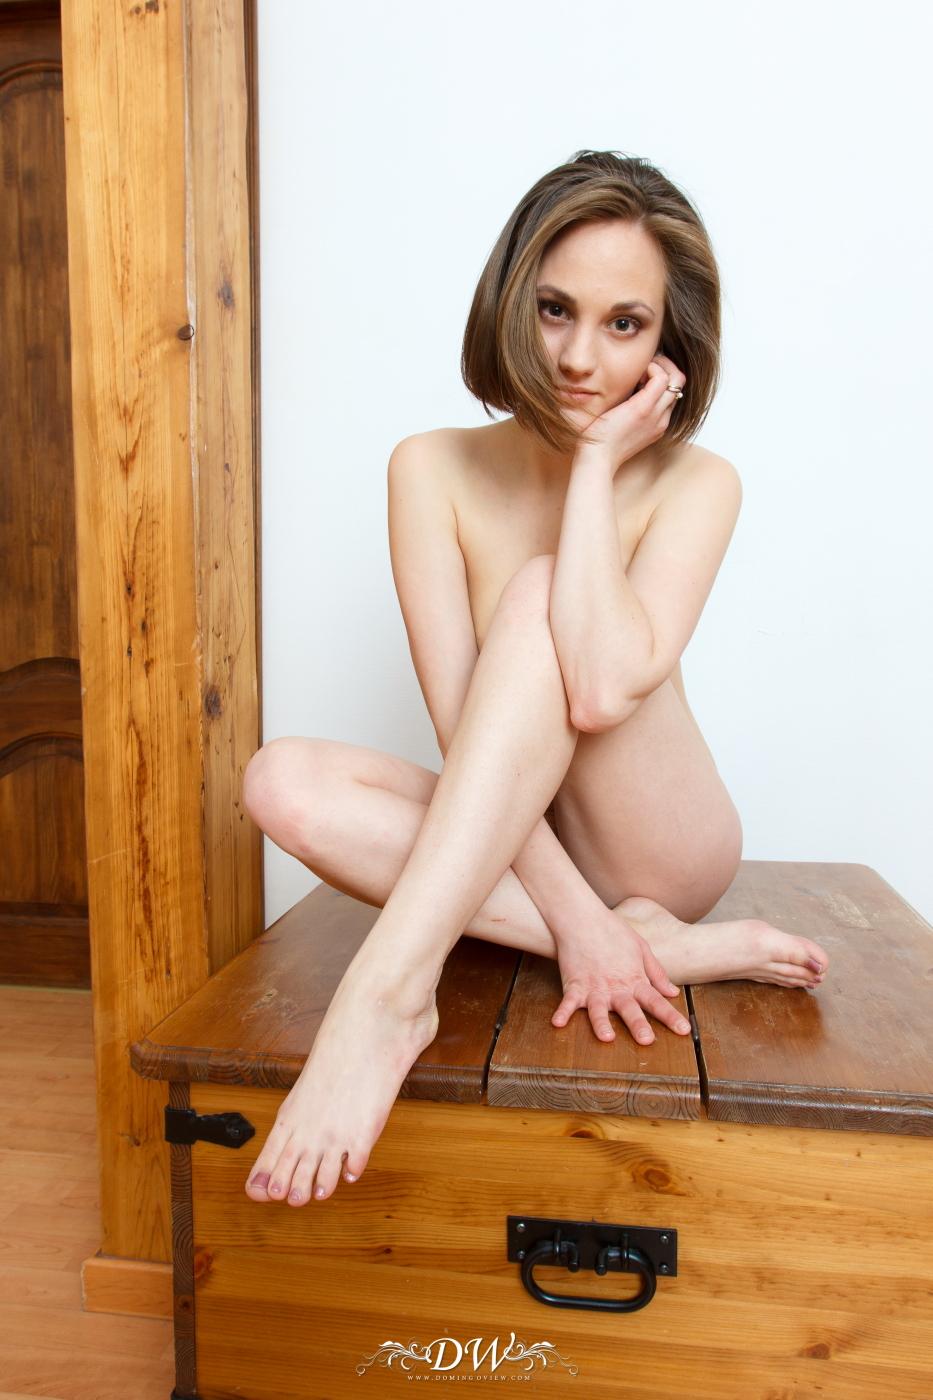 Teen nude posing